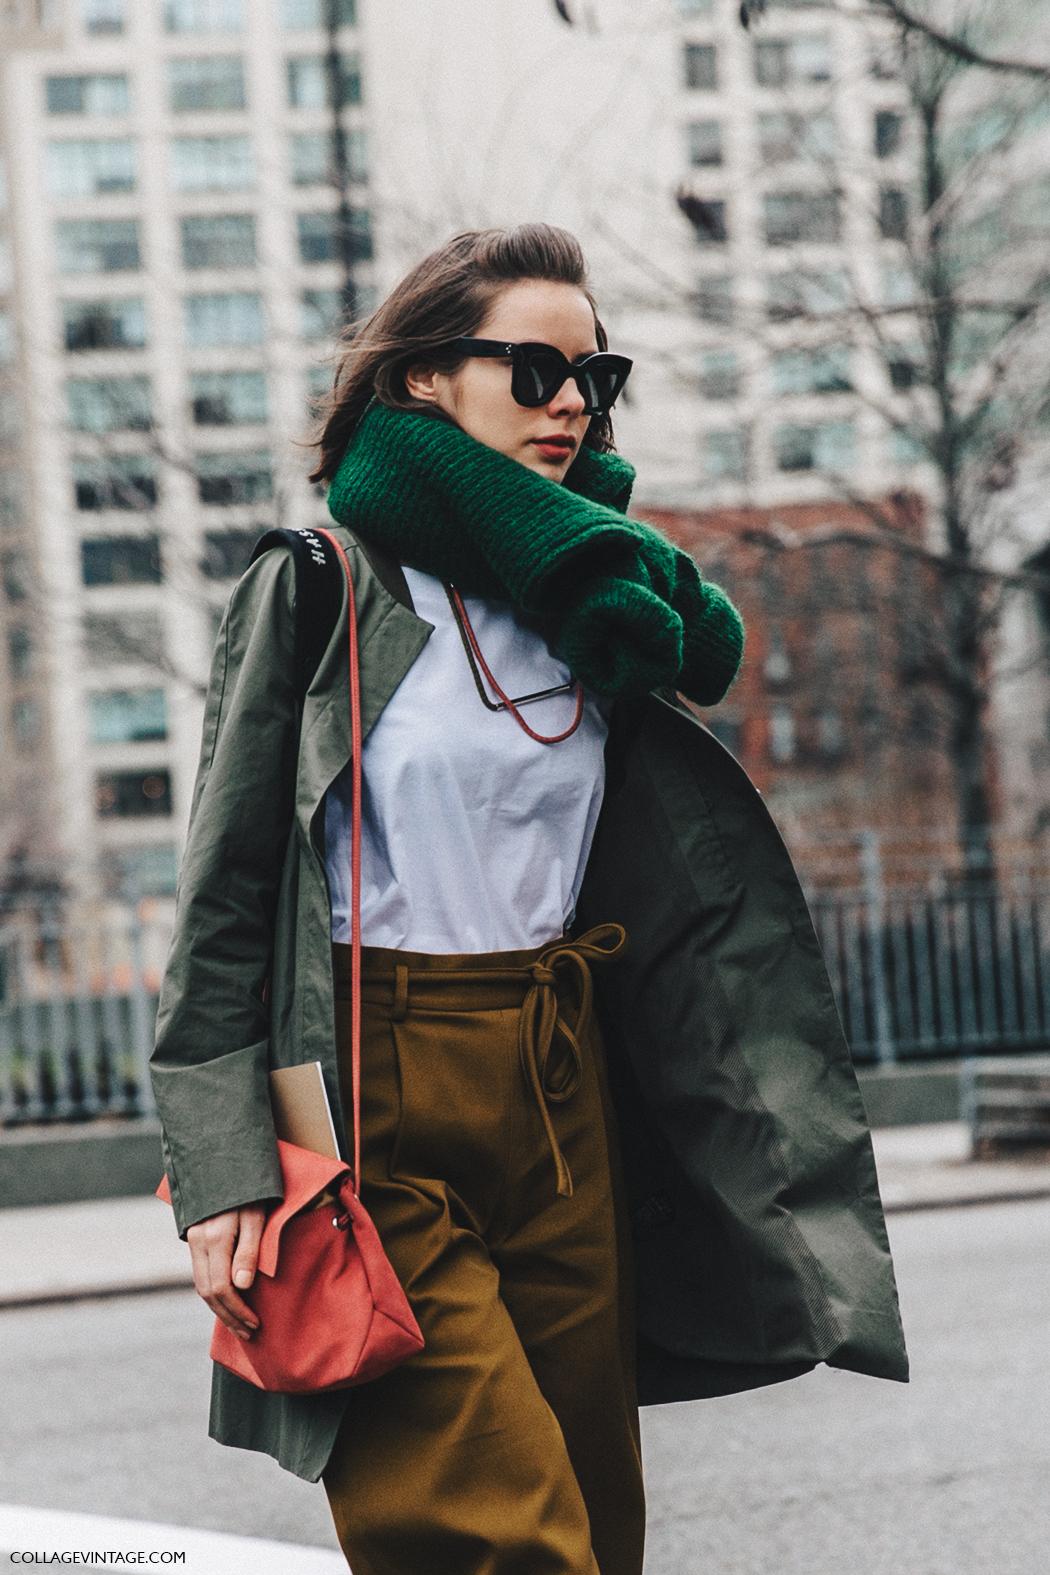 NYFW-New_York_Fashion_Week-Fall_Winter-17-Street_Style-Maxi_Scarf-Trench-